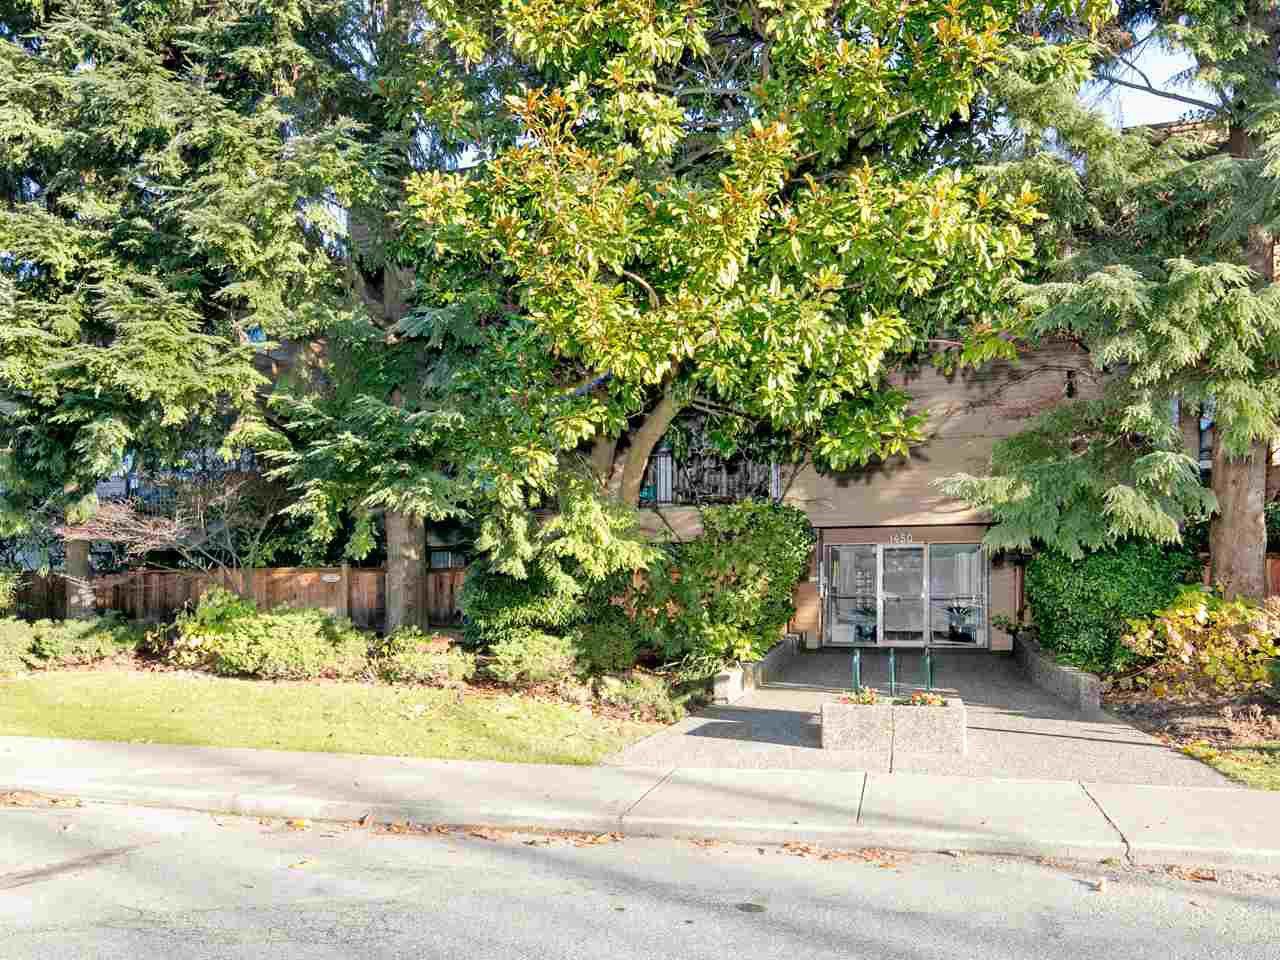 "Main Photo: 308 1450 LABURNUM Street in Vancouver: Kitsilano Condo for sale in ""KITSILANO POINT"" (Vancouver West)  : MLS®# R2227248"